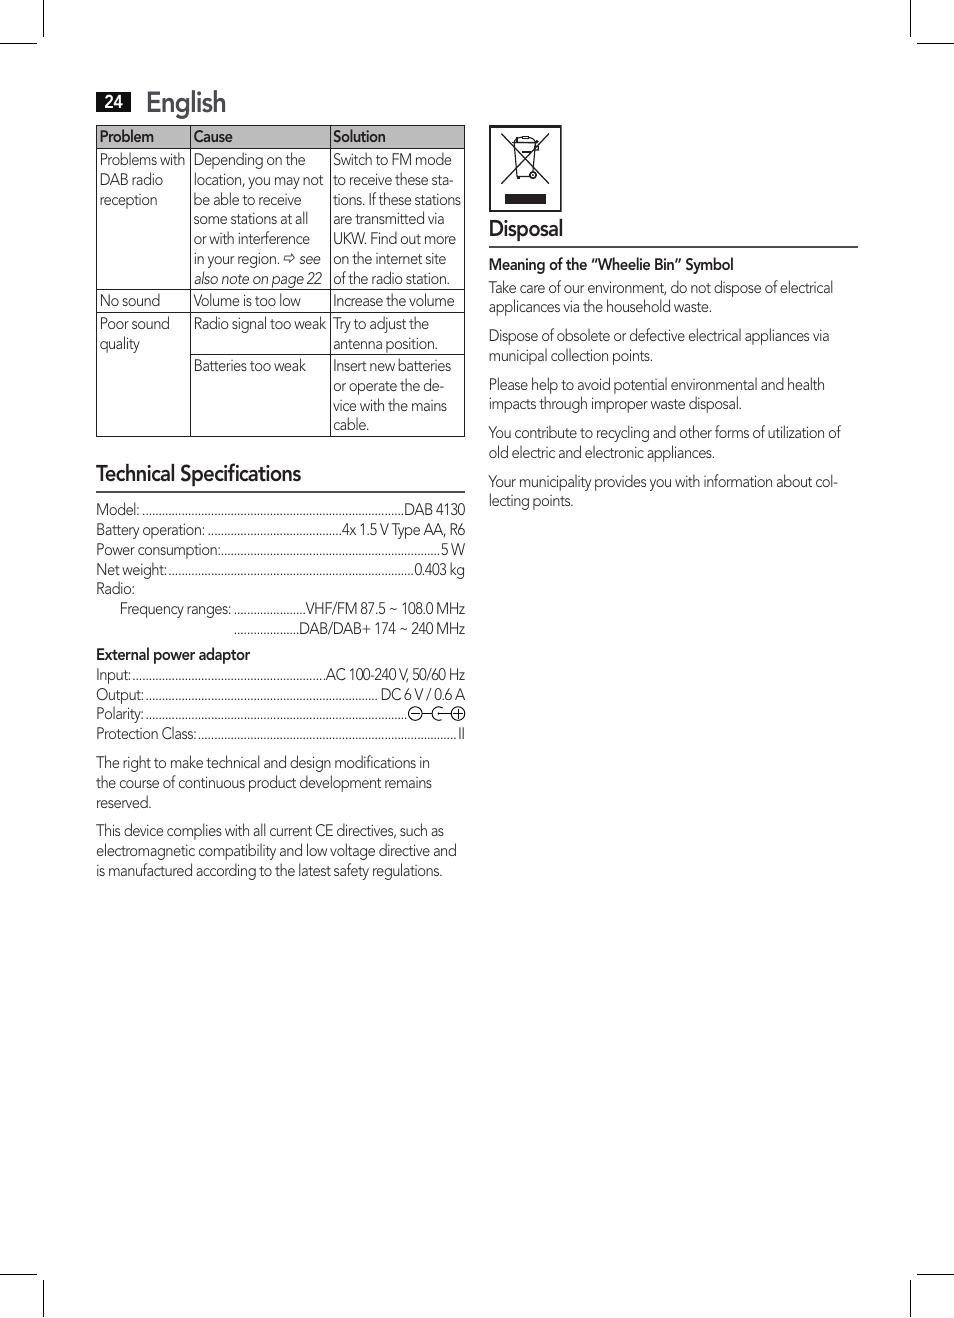 english technical specifications disposal aeg dab 4130 user rh manualsdir com Instruction Manual Book Instruction Manual